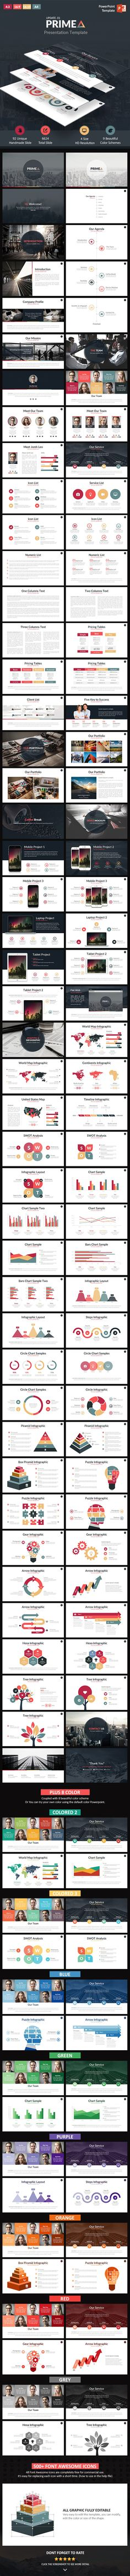 Primea - PowerPoint Presentation Template #Design #Powerpoint #Template Download Here : http://graphicriver.net/item/primea-powerpoint-presentation-template/11828976?utm_source=sharepi?ref=Pan_Design